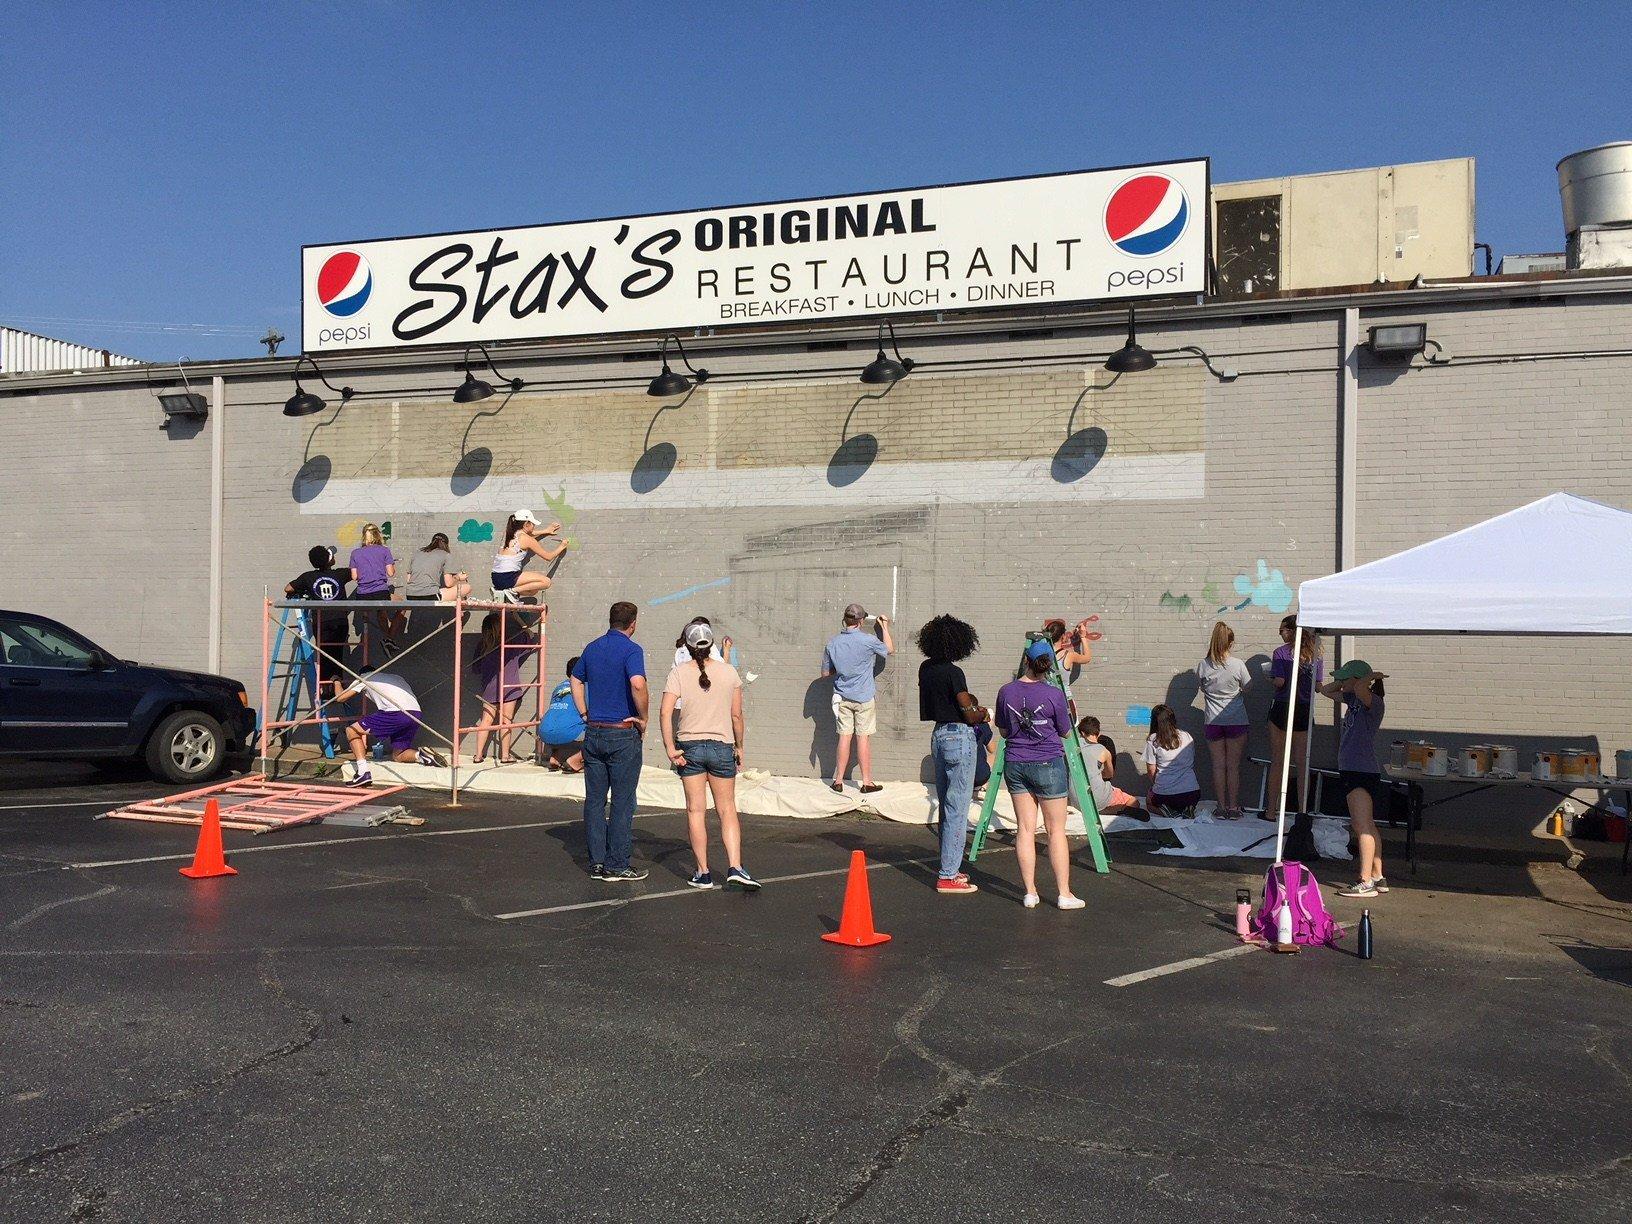 Furman University students paint community mural on Stax's Original Restaurant (FOX Carolina/May 10, 2018)